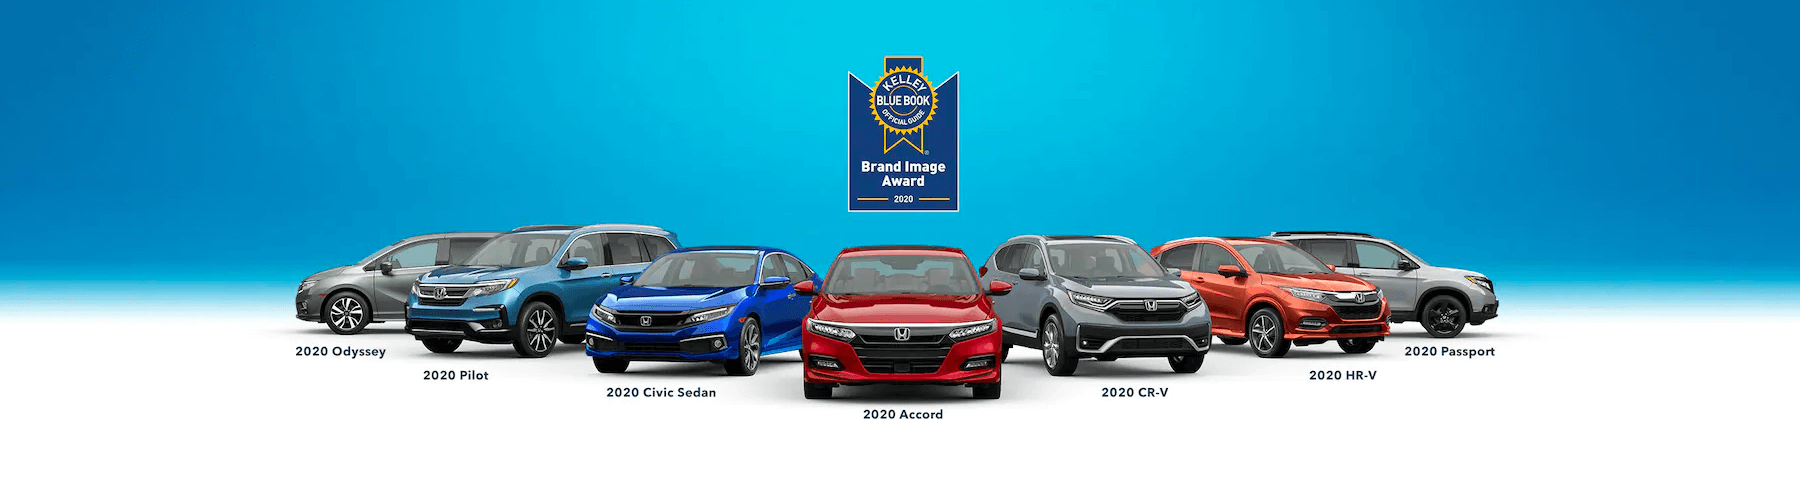 Honda Kelley Blue Book 2020 Brand Image Award Slider